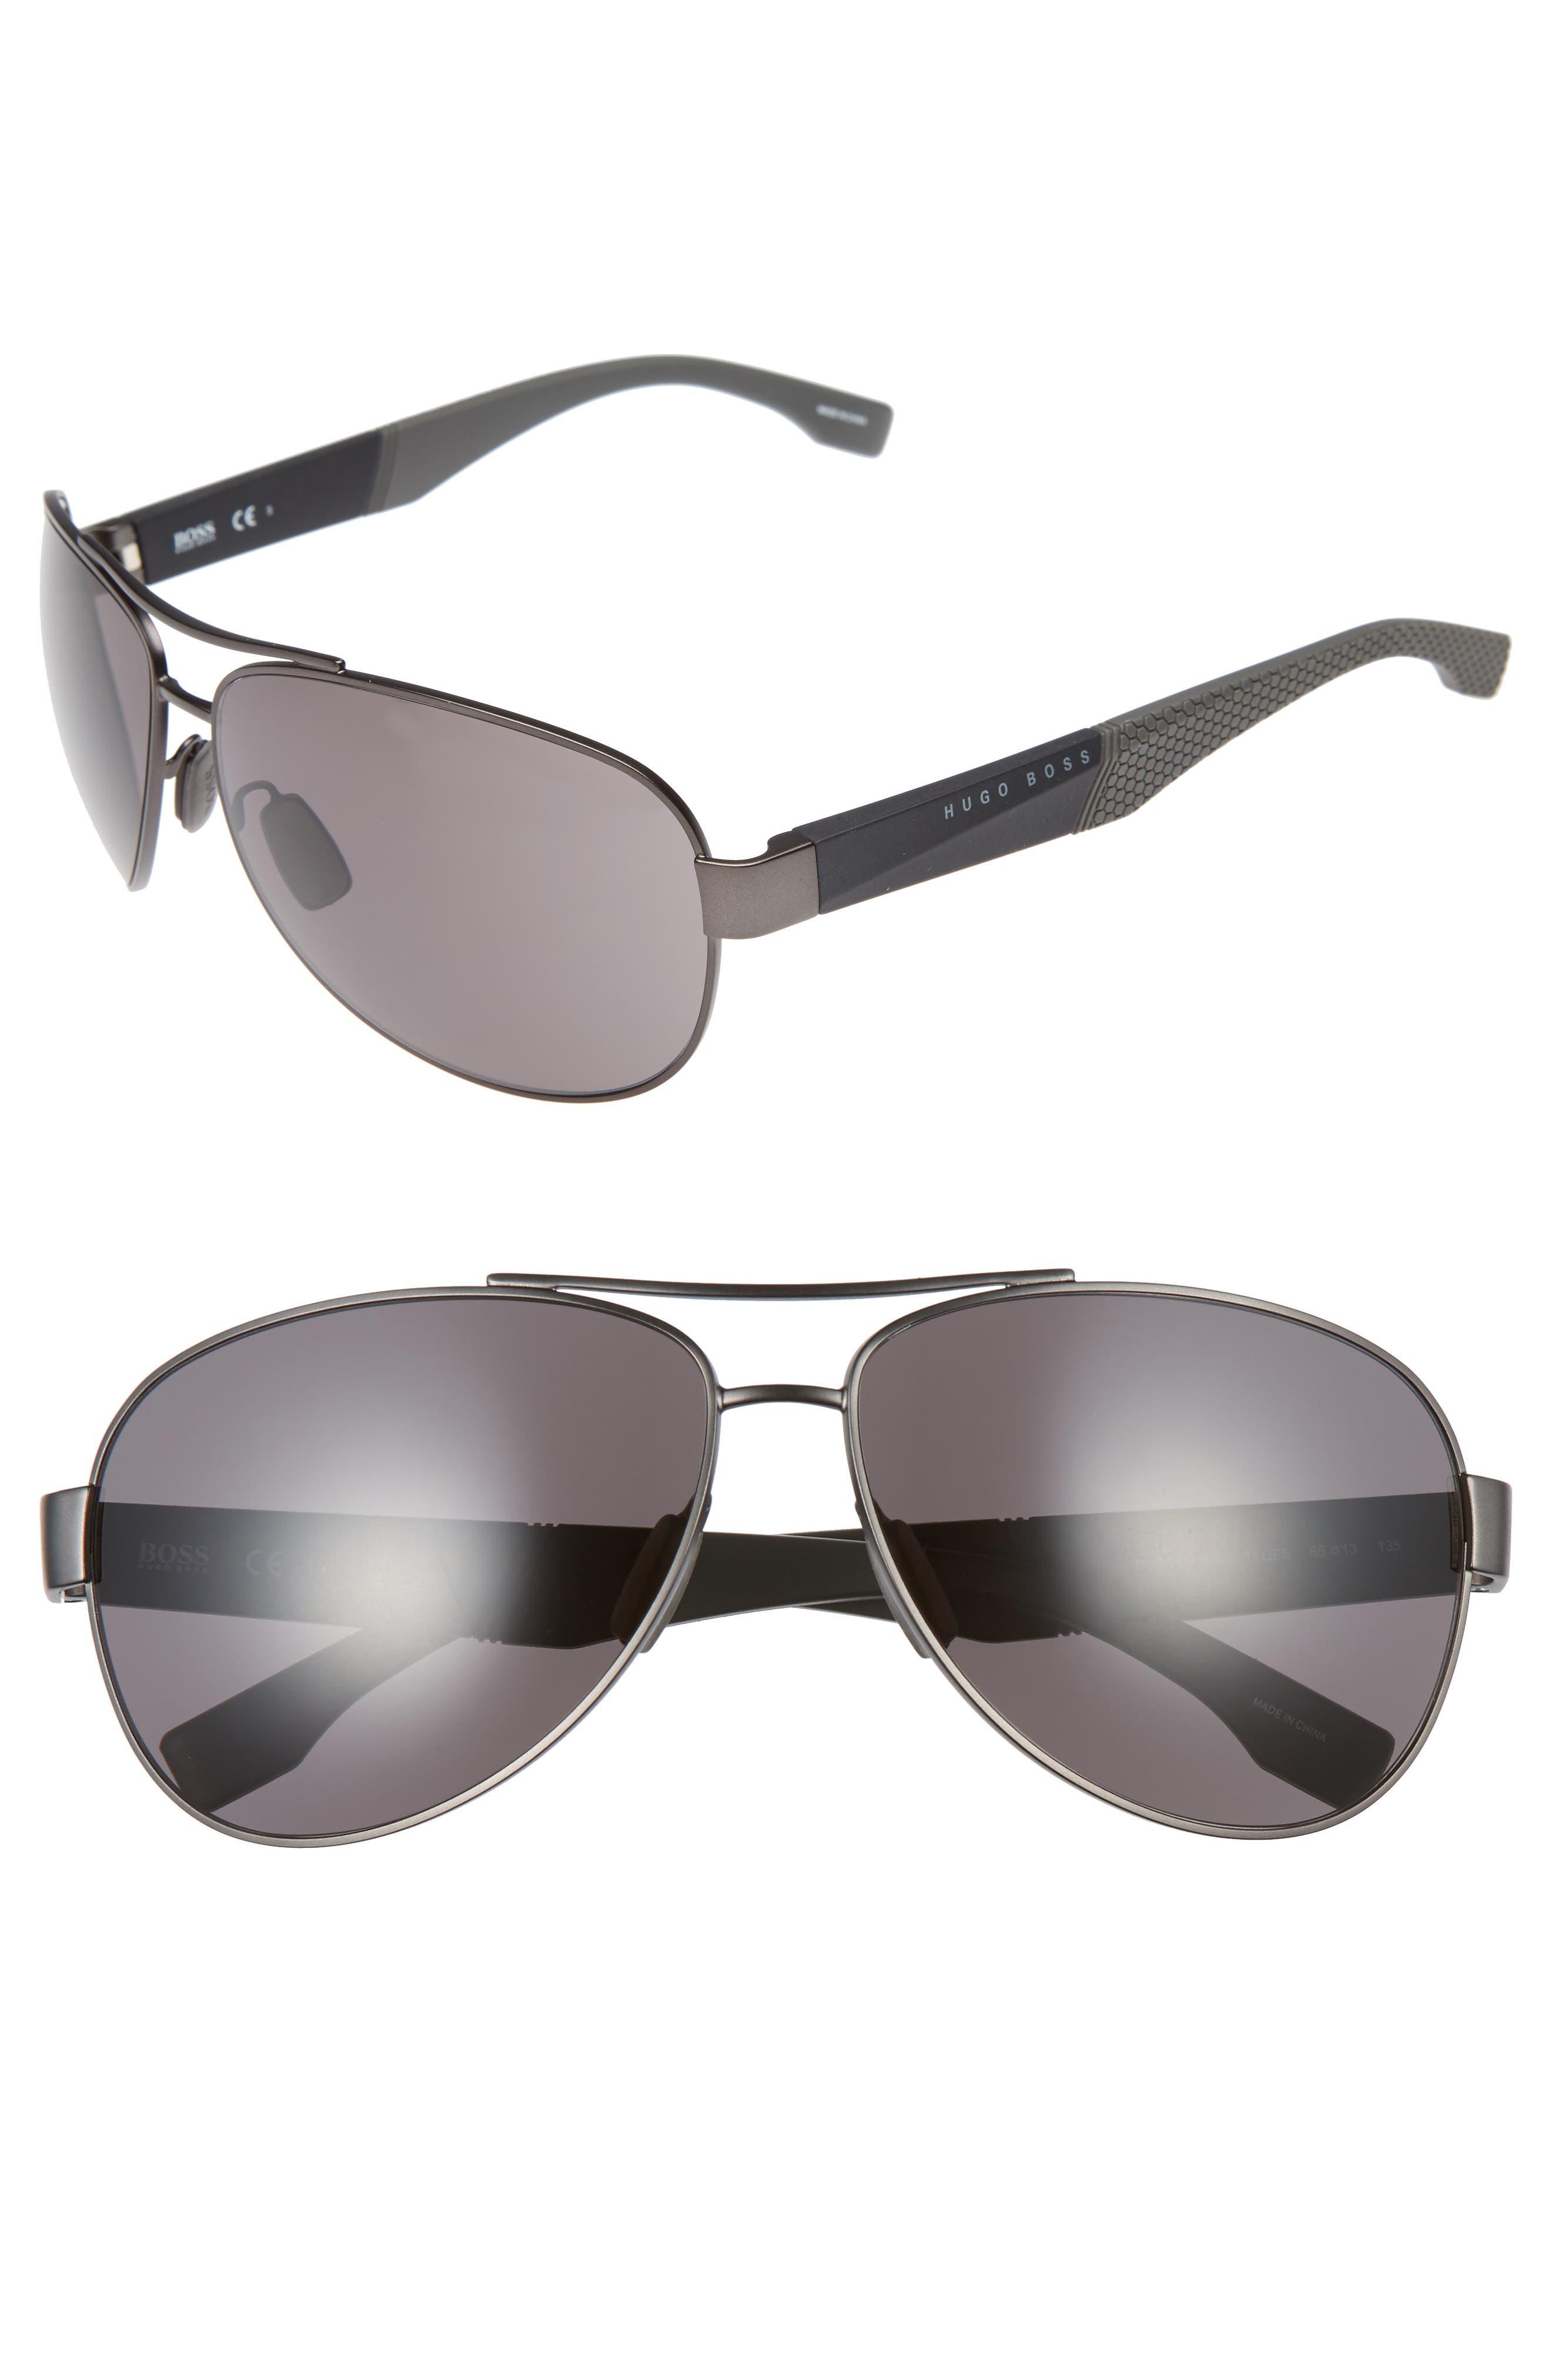 65mm Aviator Sunglasses,                         Main,                         color, GREY BLACK/ GREY